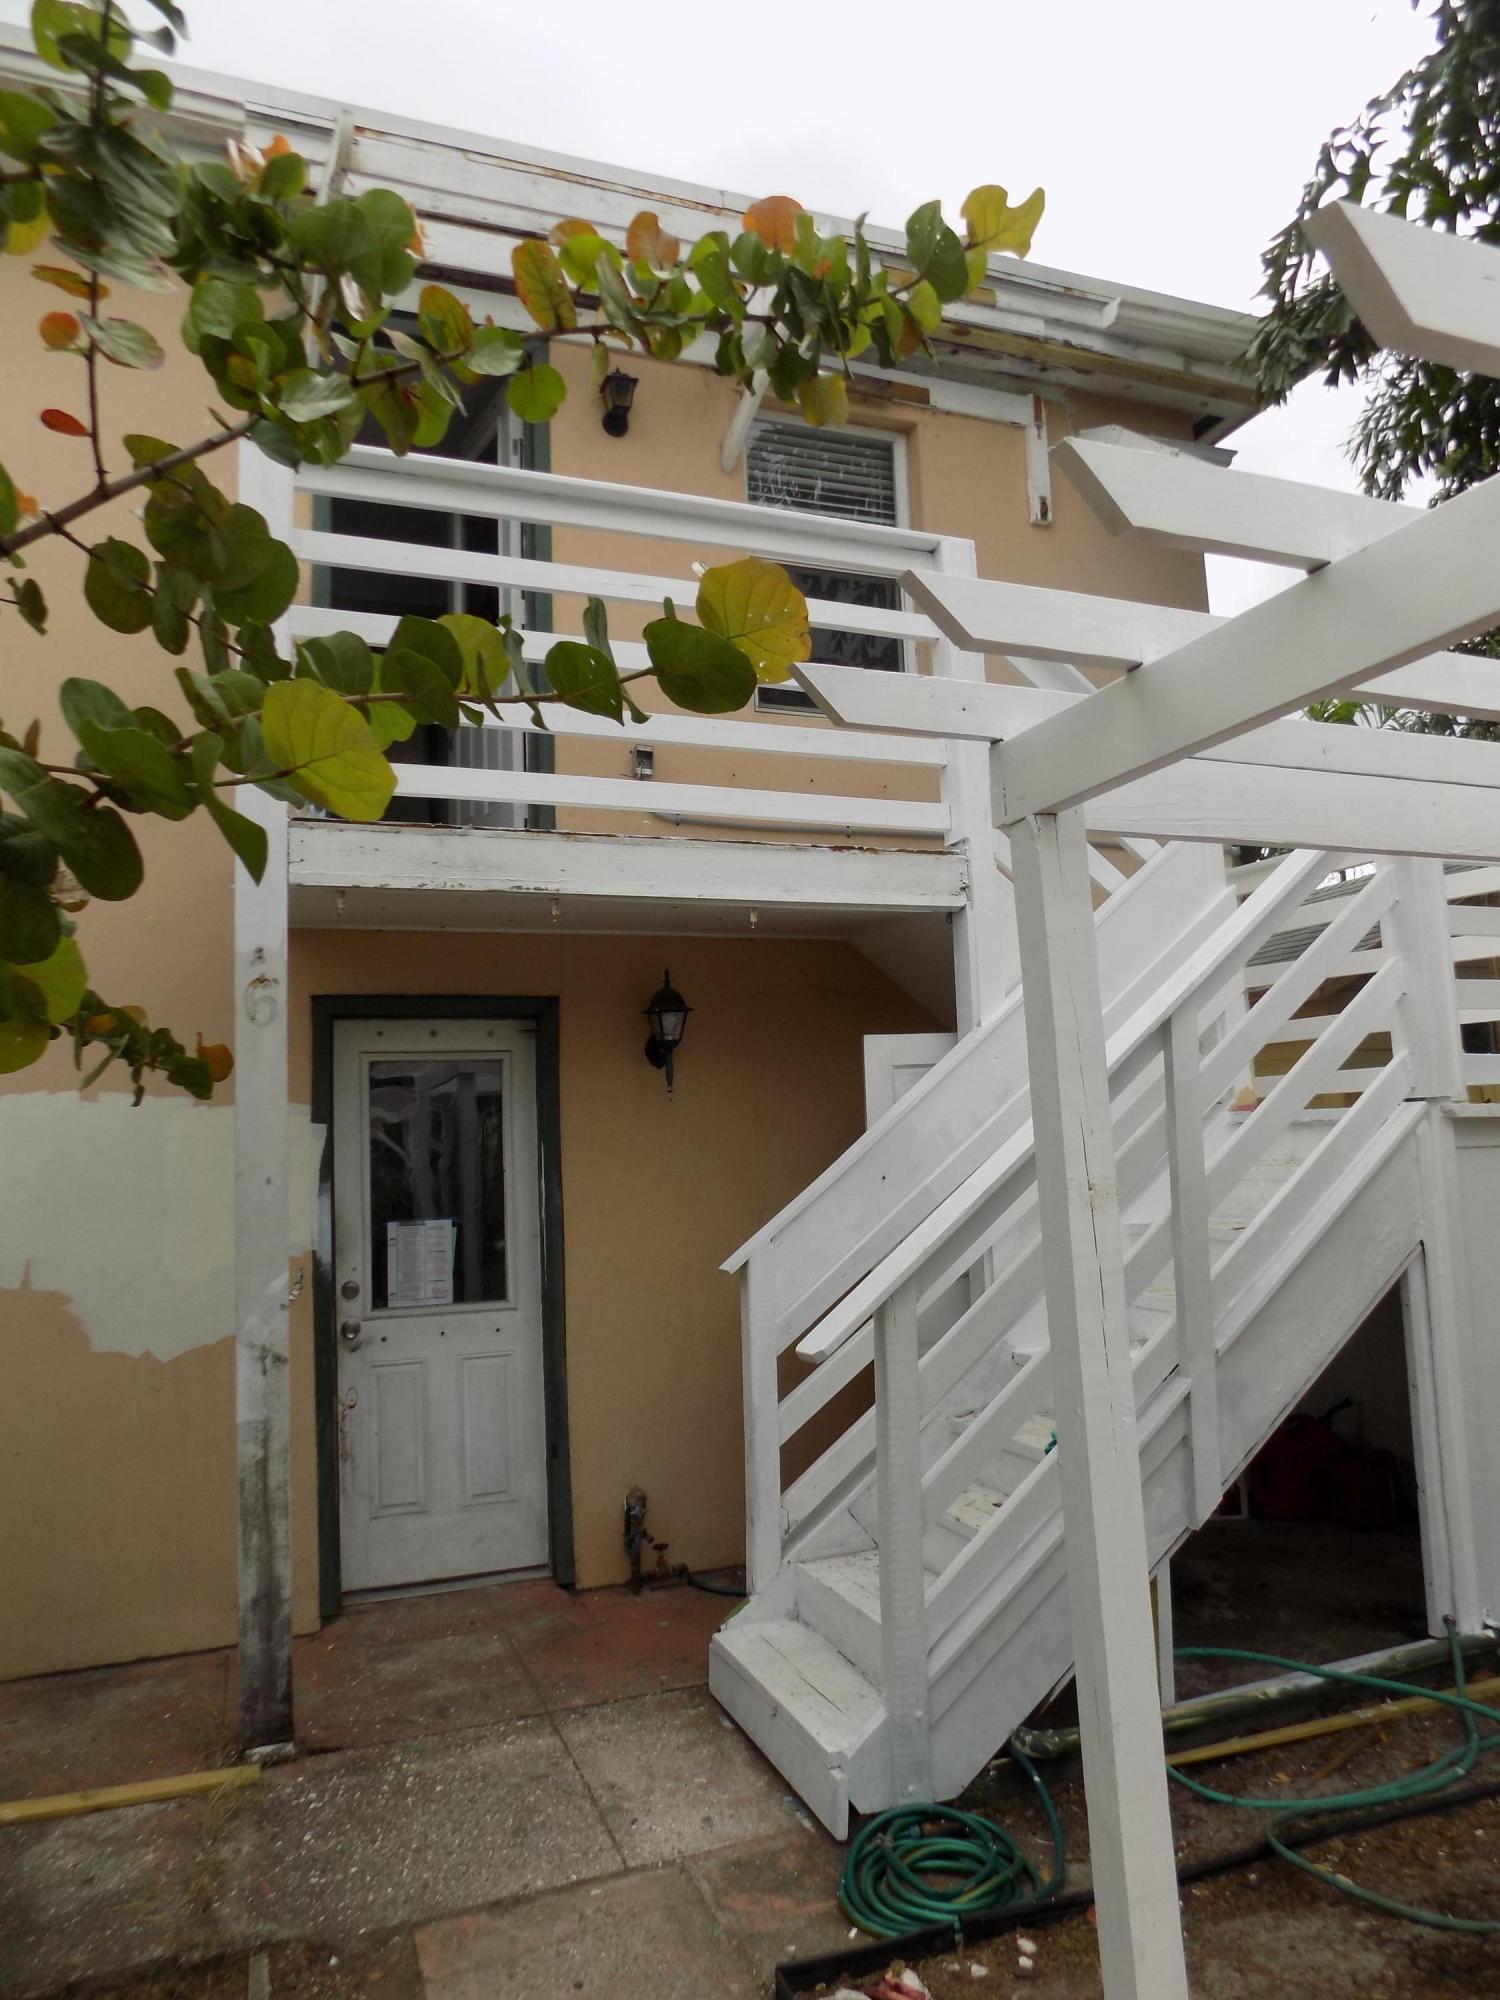 516 J St, Lake Worth, Florida 33460, 1 Bedroom Bedrooms, ,1 BathroomBathrooms,Duplex/Triplex/Quadplex,For Rent,J St,2,RX-10522684